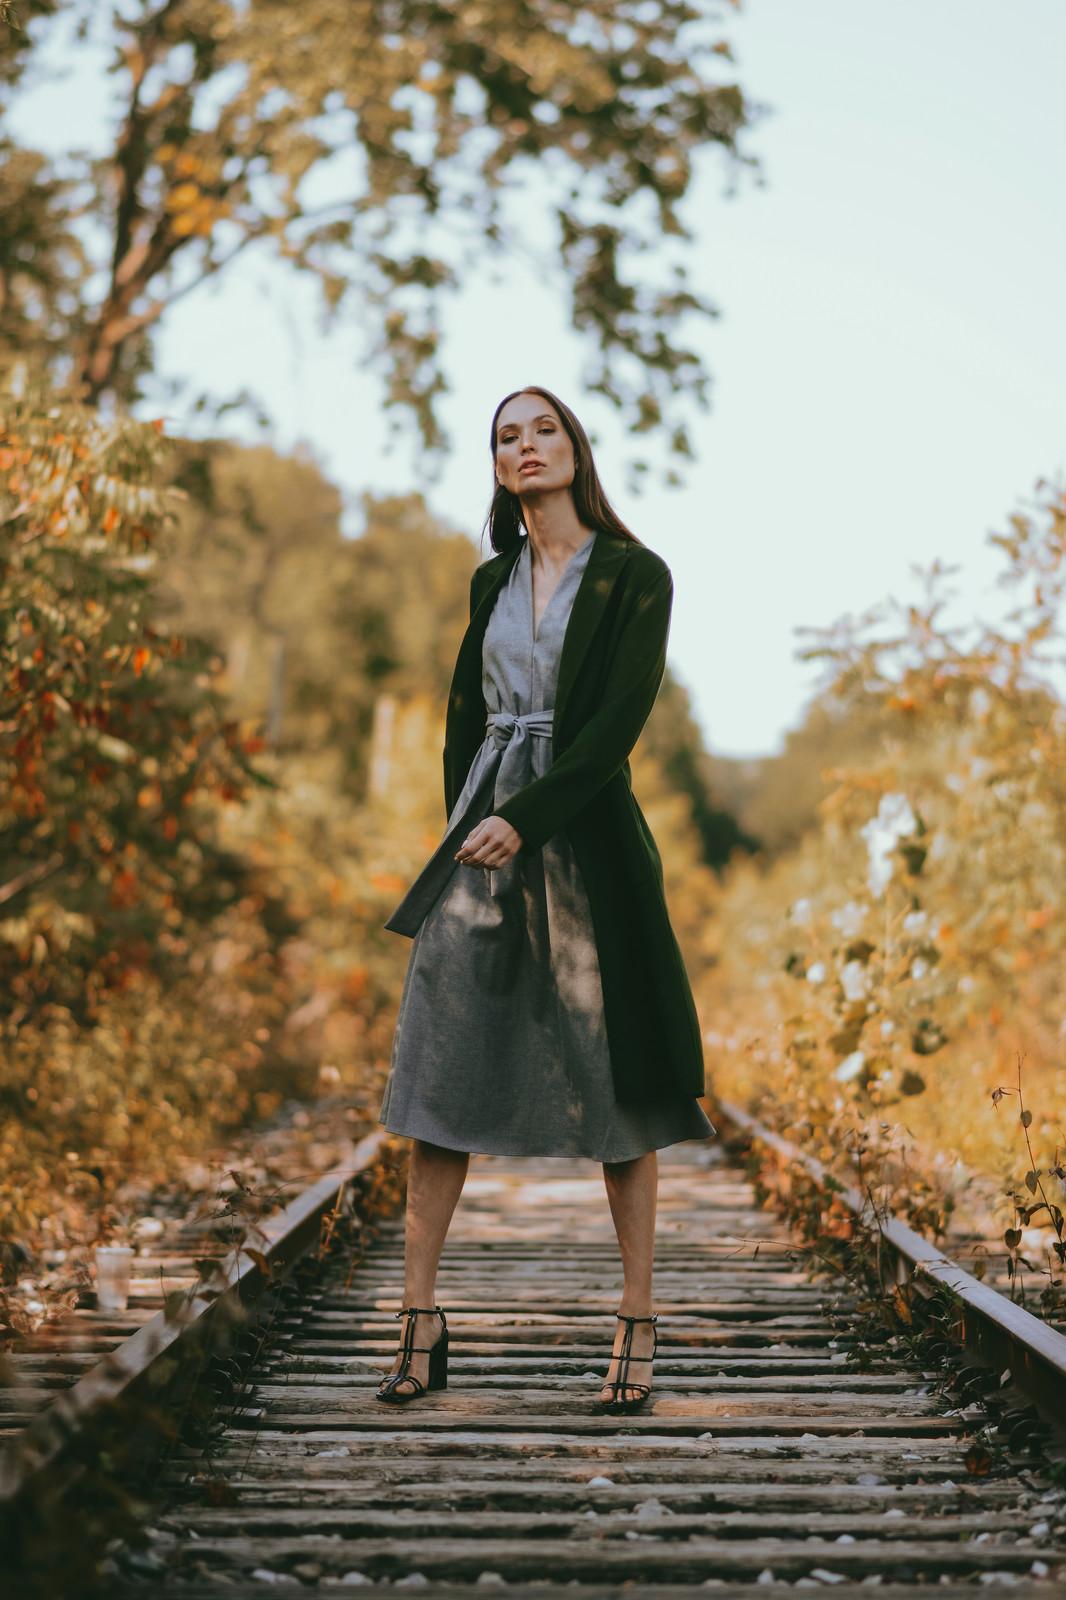 Model: Carina Kresic Agency: Next Models Stylist: Amy Thomson MUA